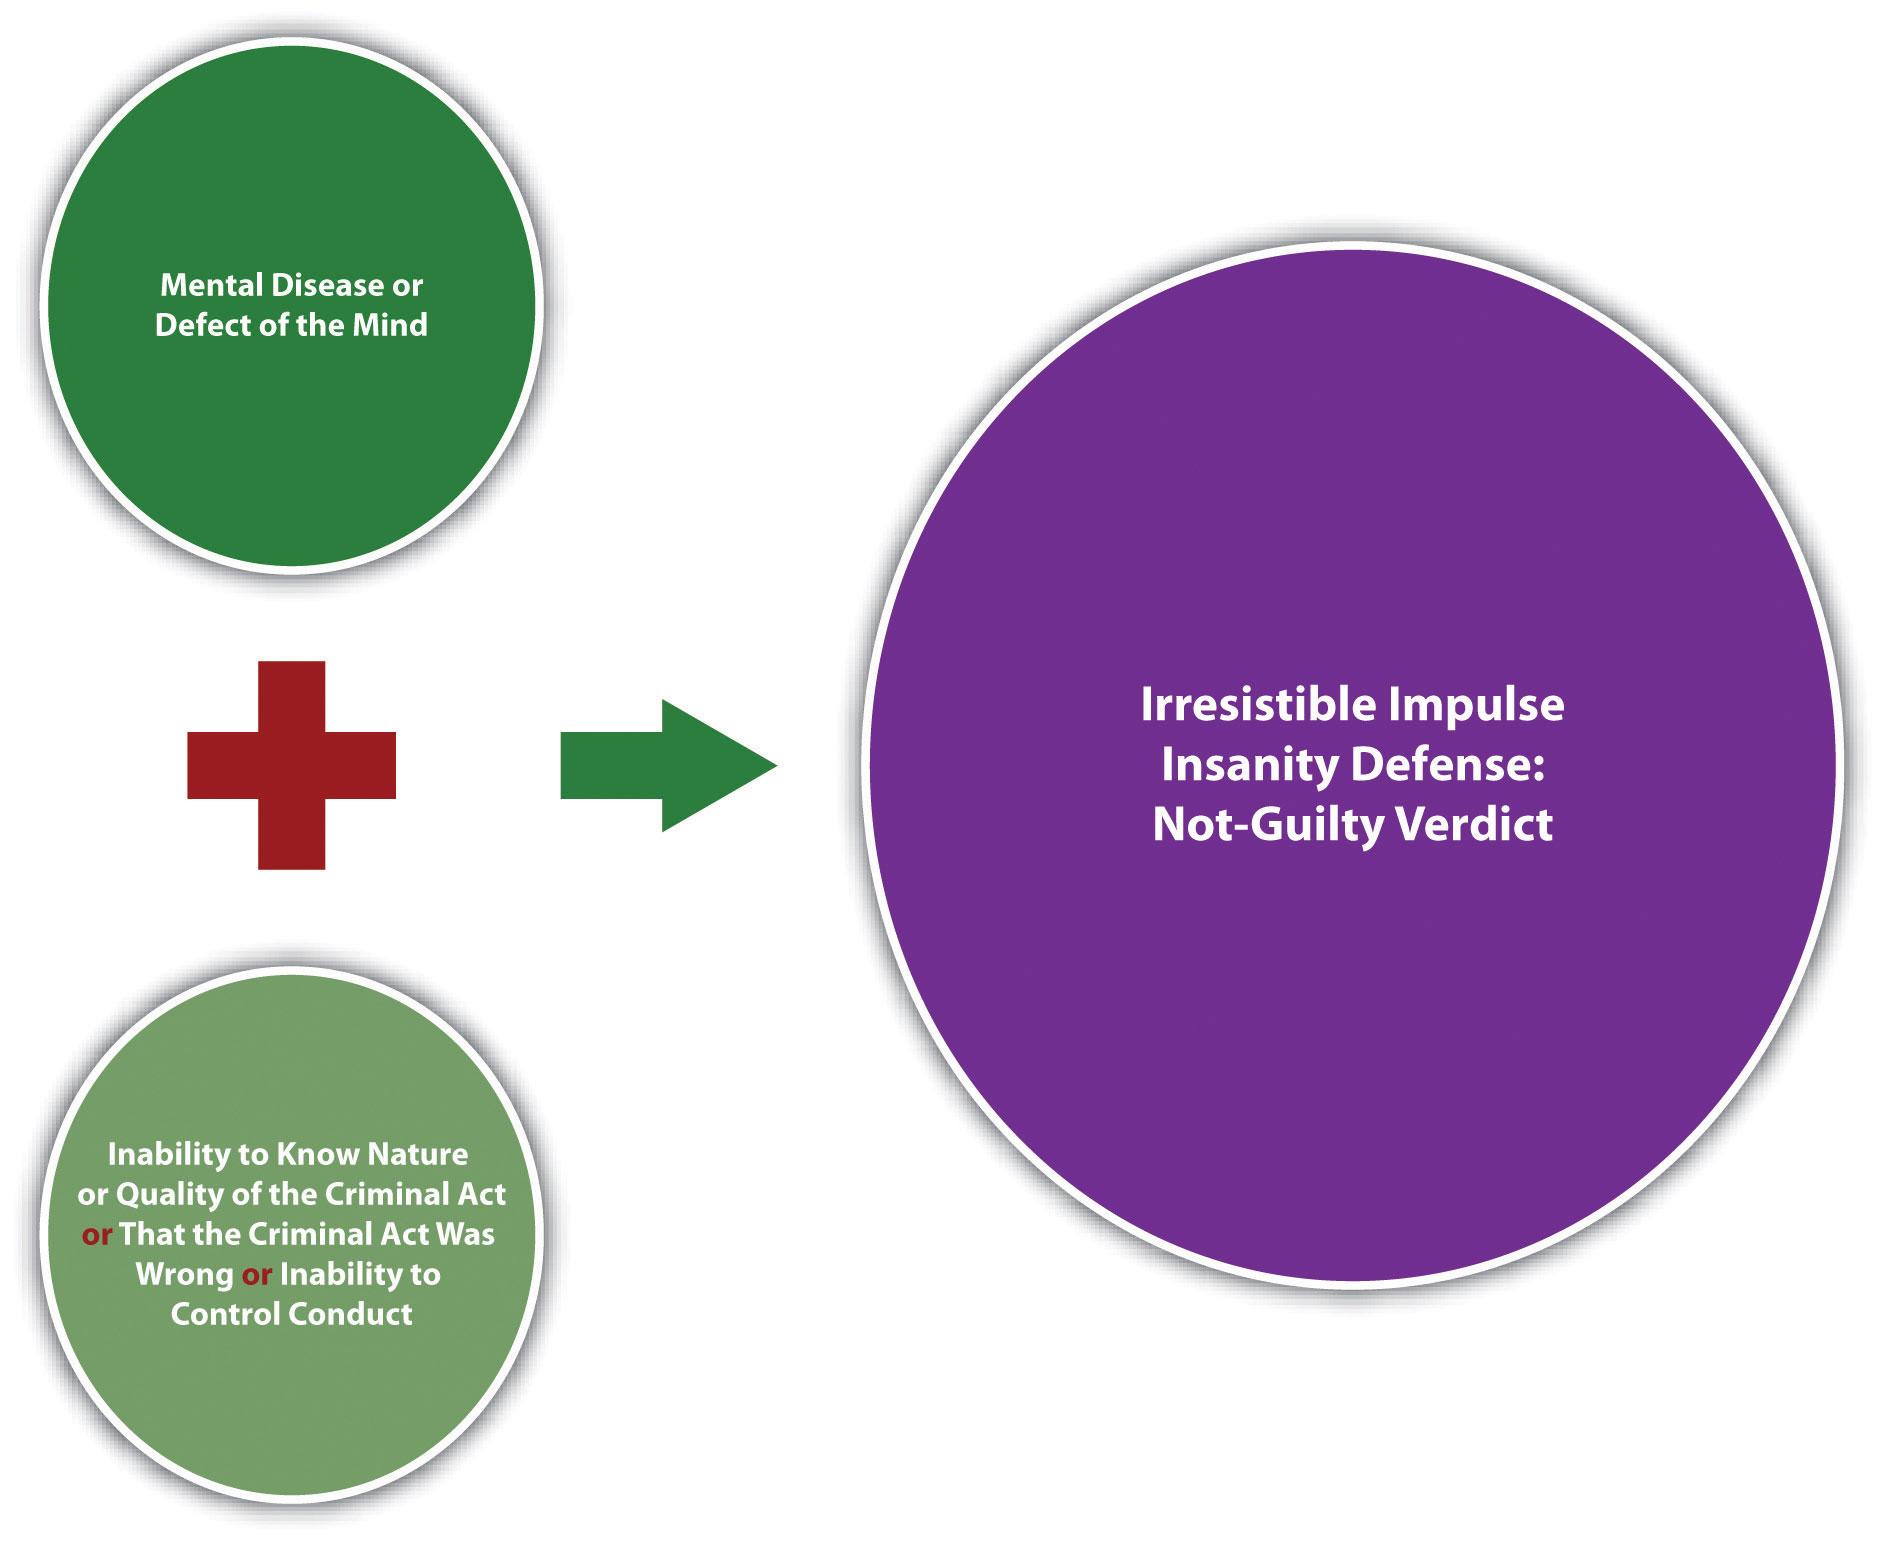 Irresistible Impulse Insanity Defense chart/equation